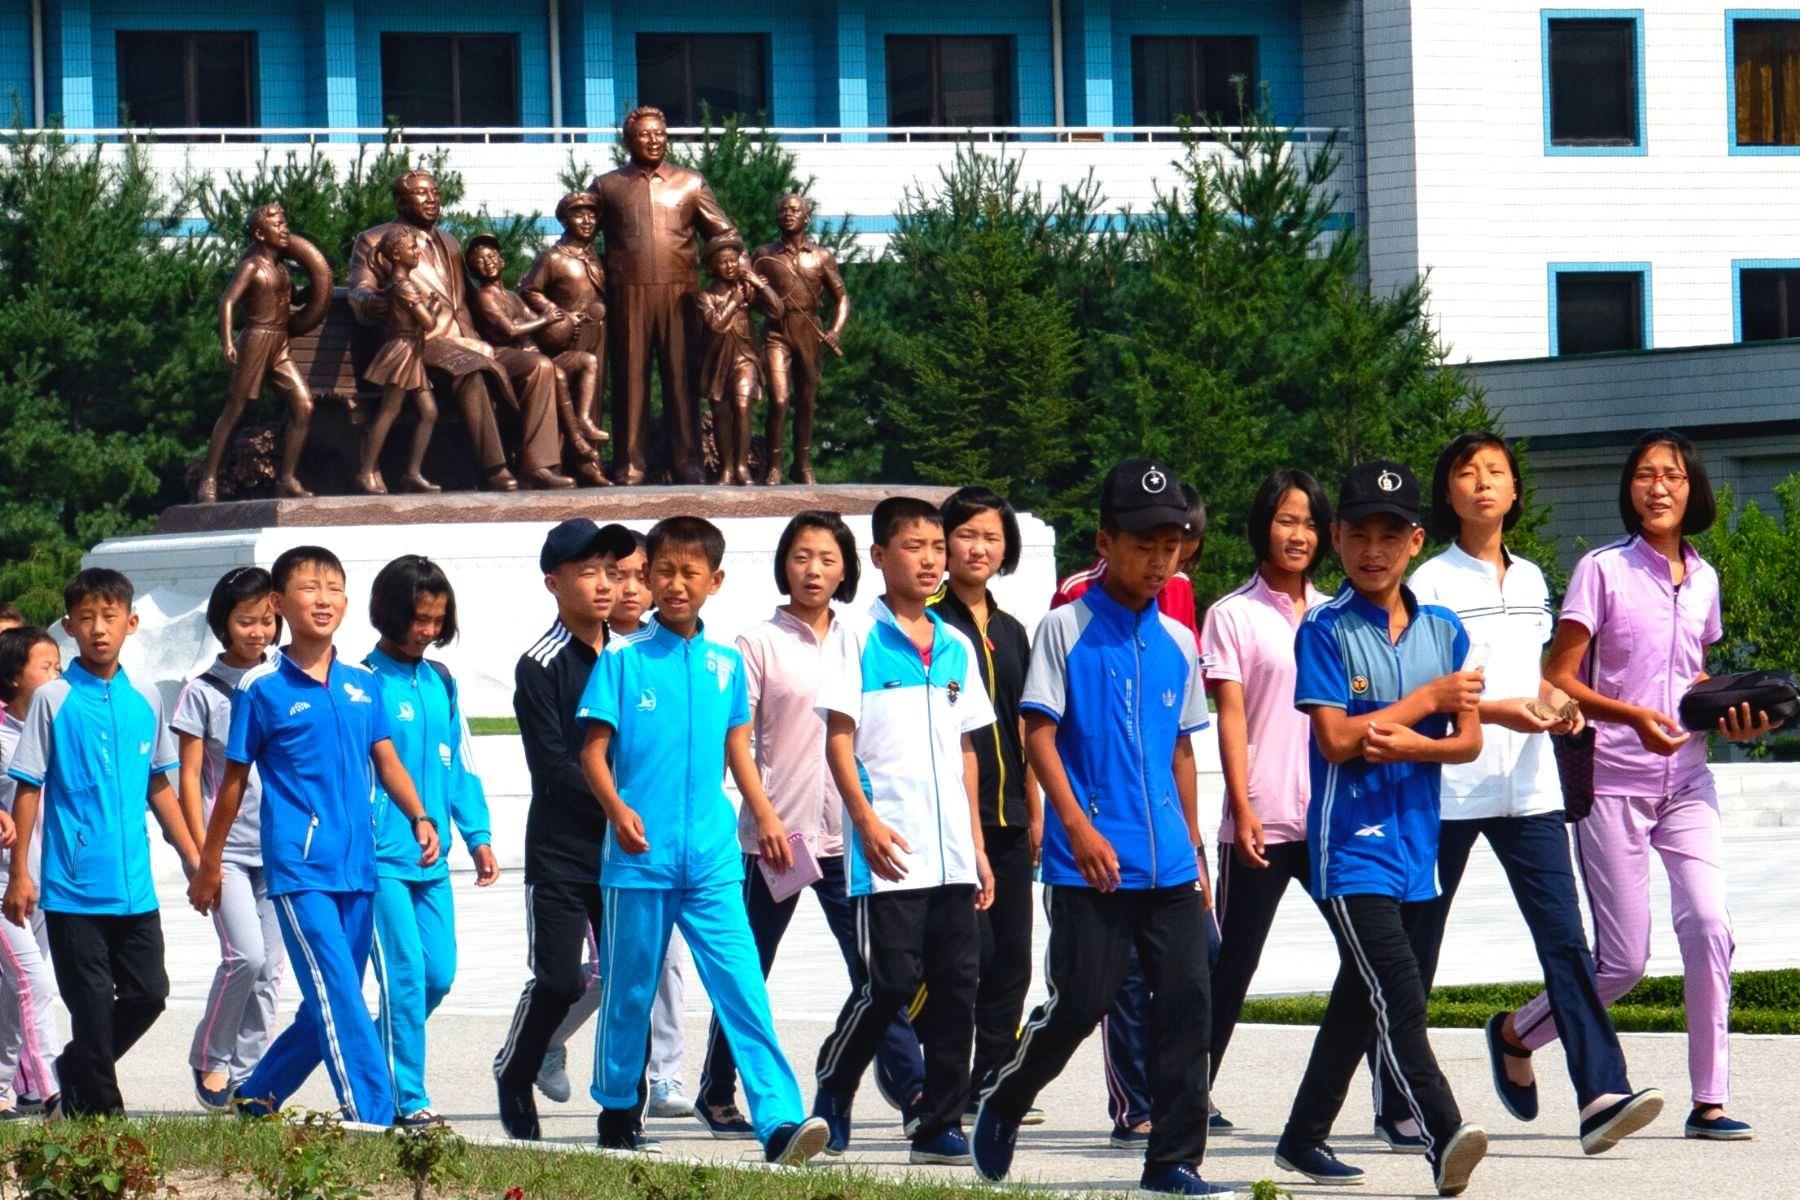 Wonsan port, North Korea (DPRK). Trip to the east coast of North Korea with KTG tours